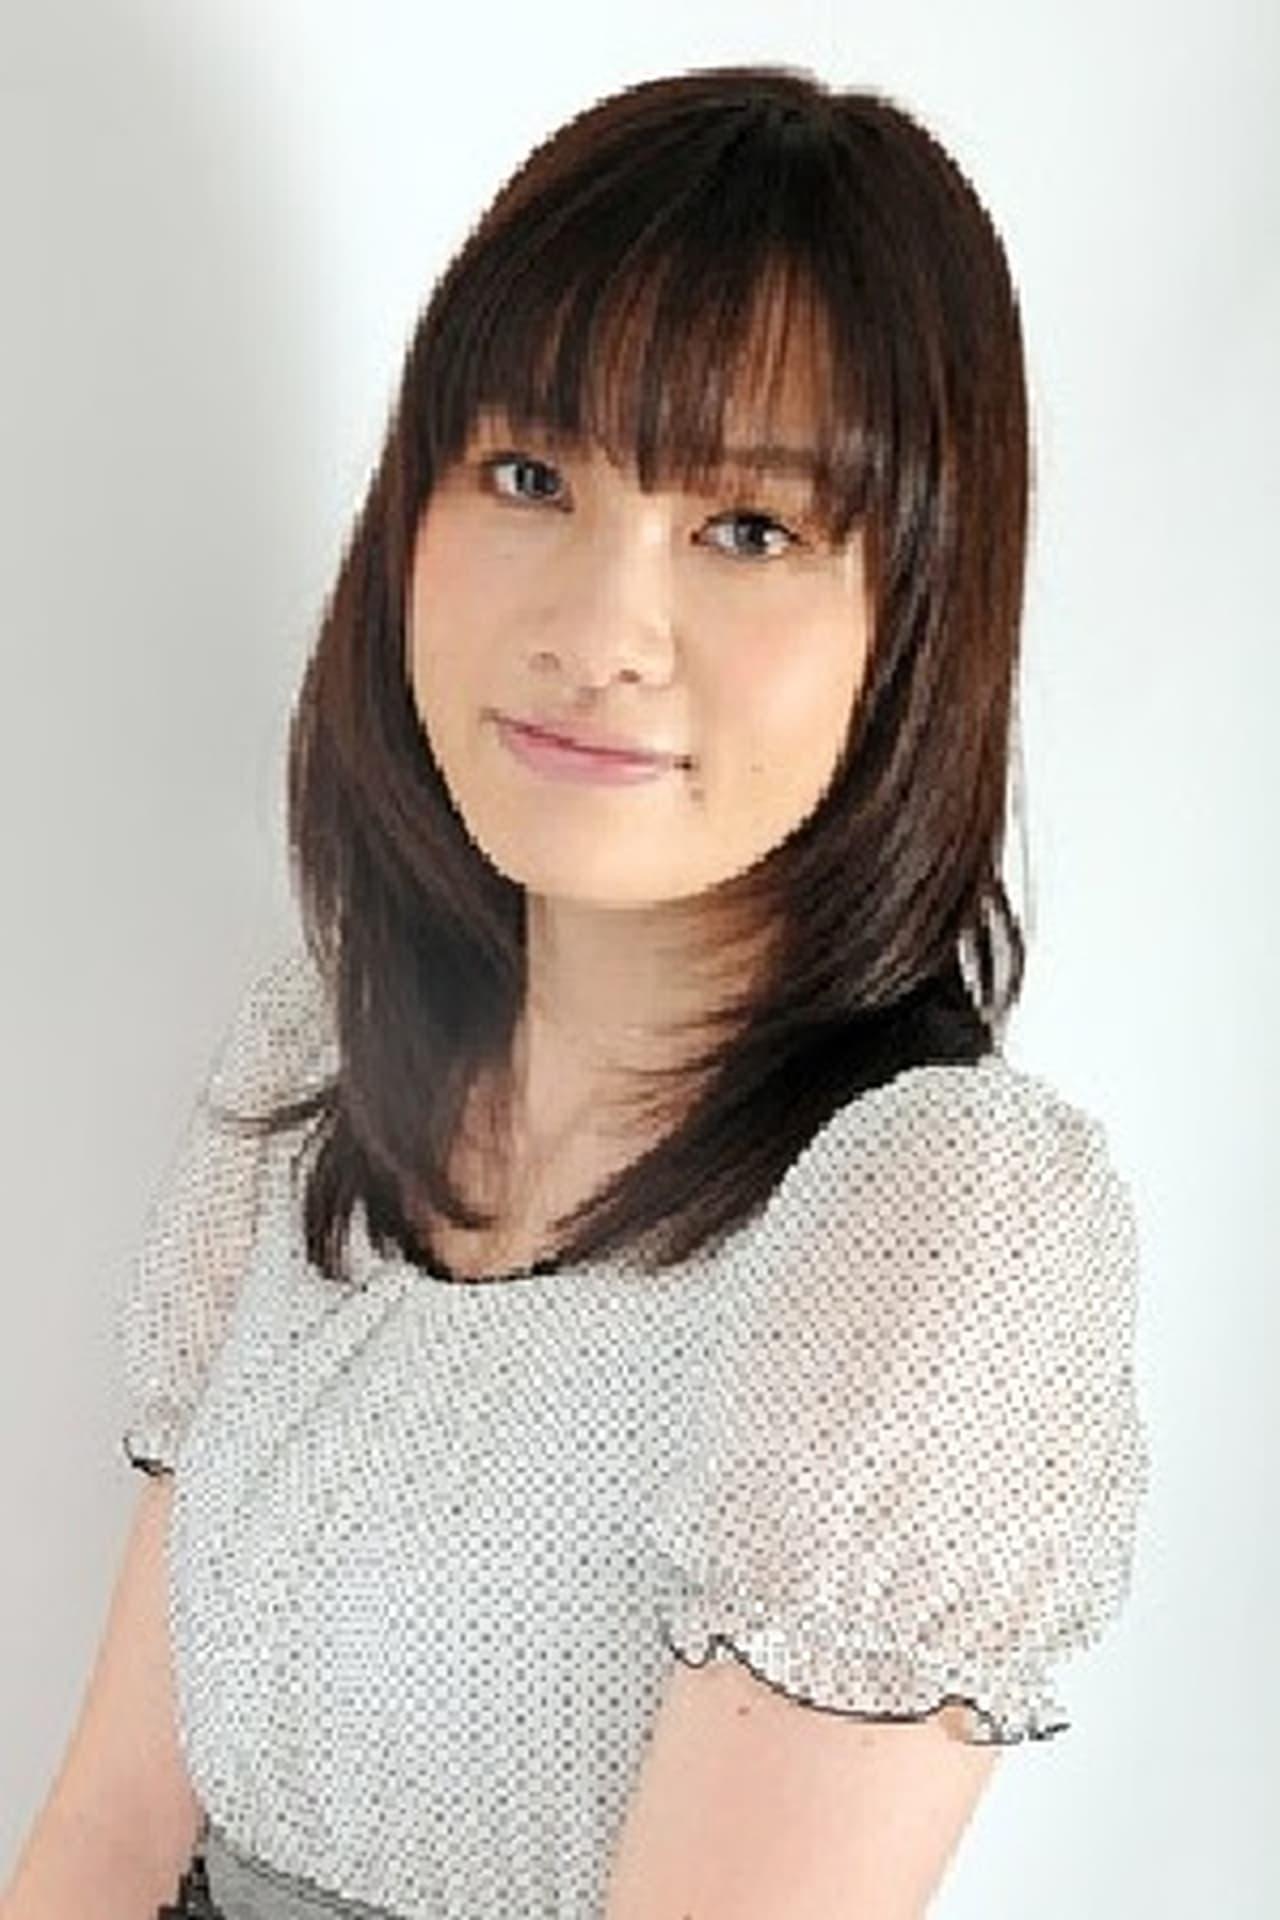 Izumi Chiba